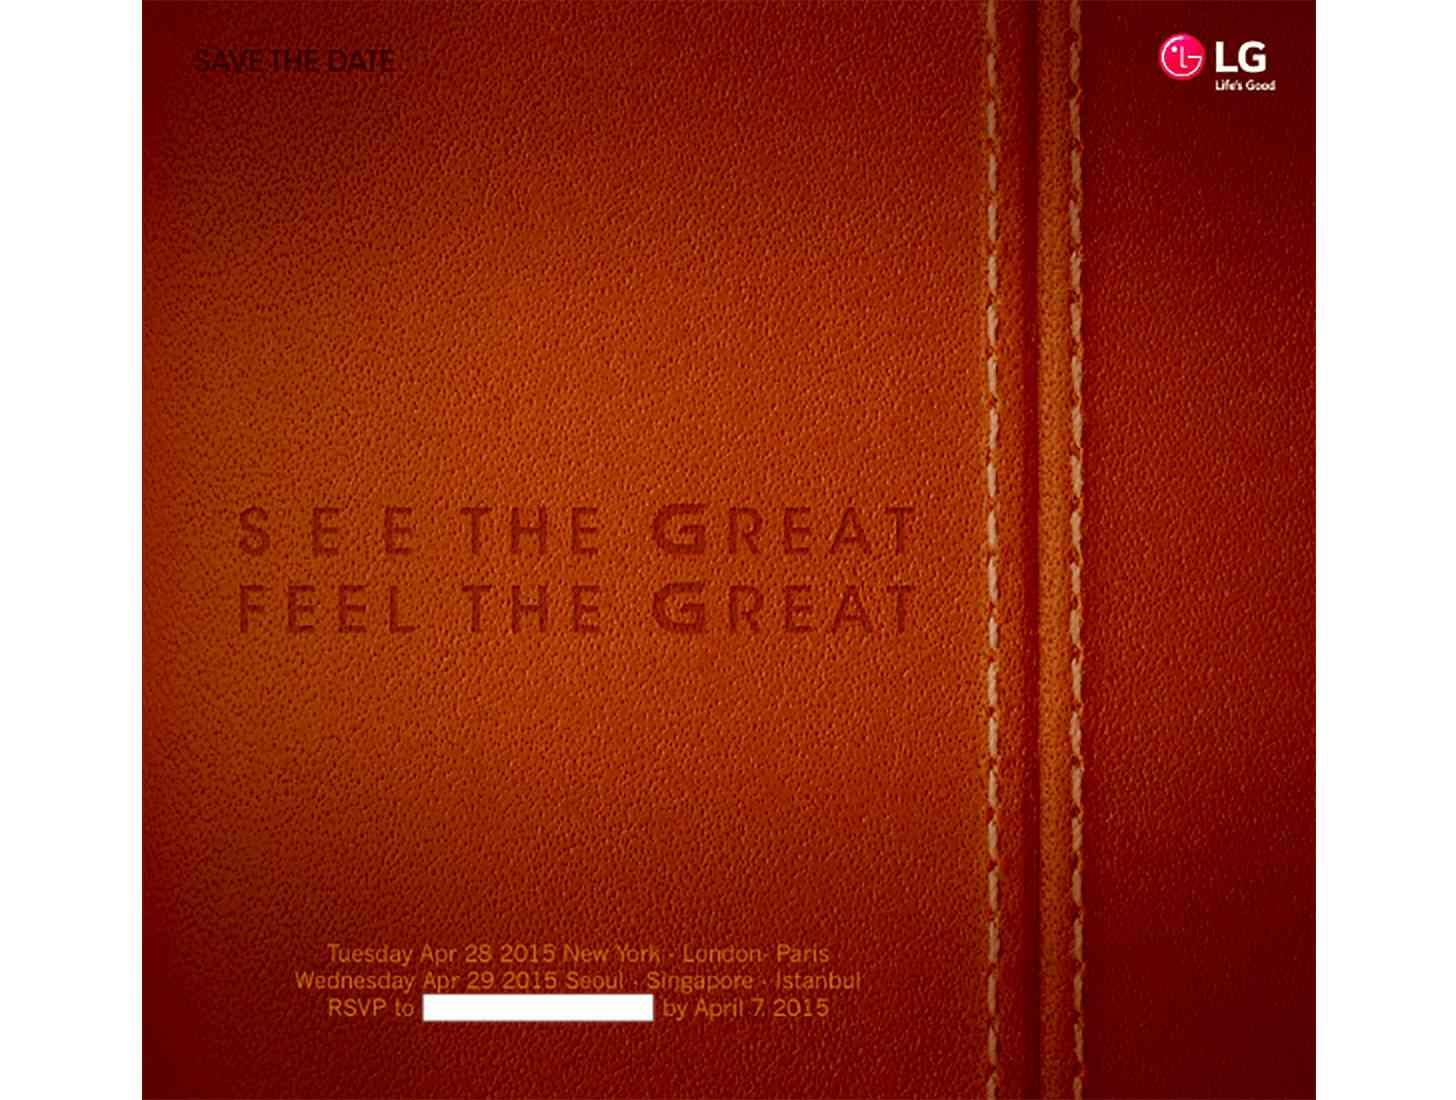 LG G4 April 28 event invitation